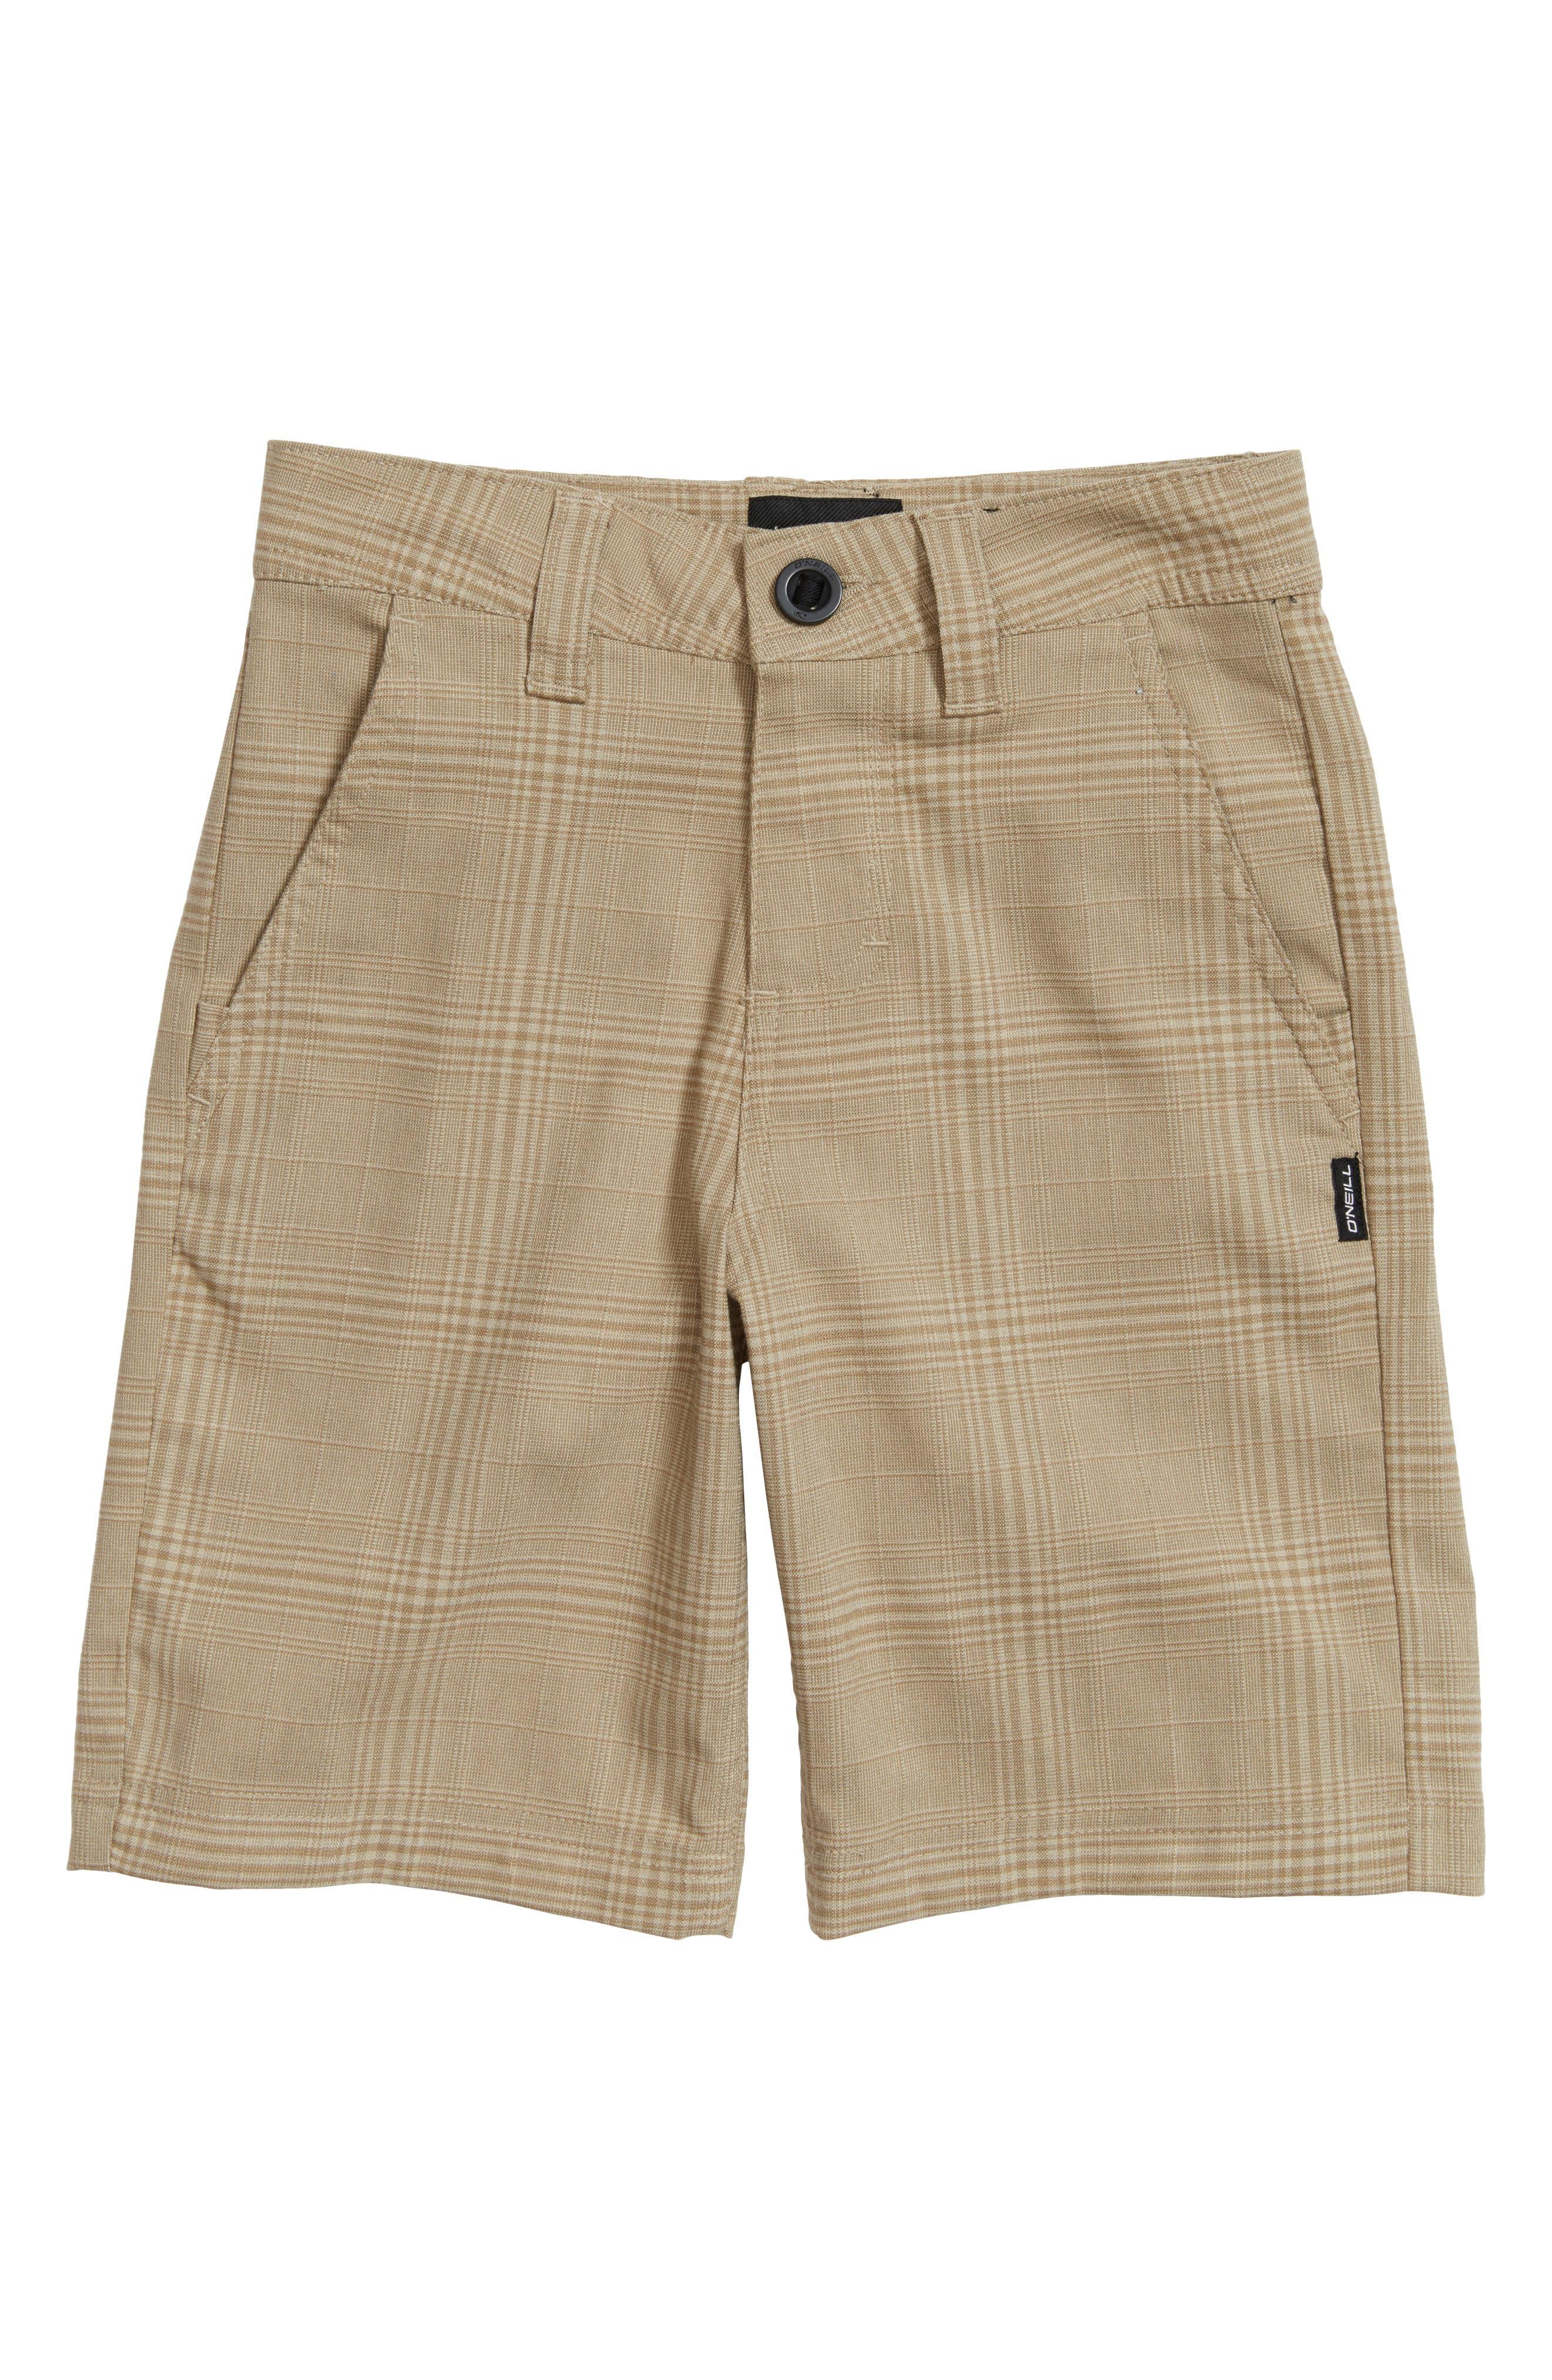 Bristol Plaid Shorts,                             Main thumbnail 1, color,                             Khaki